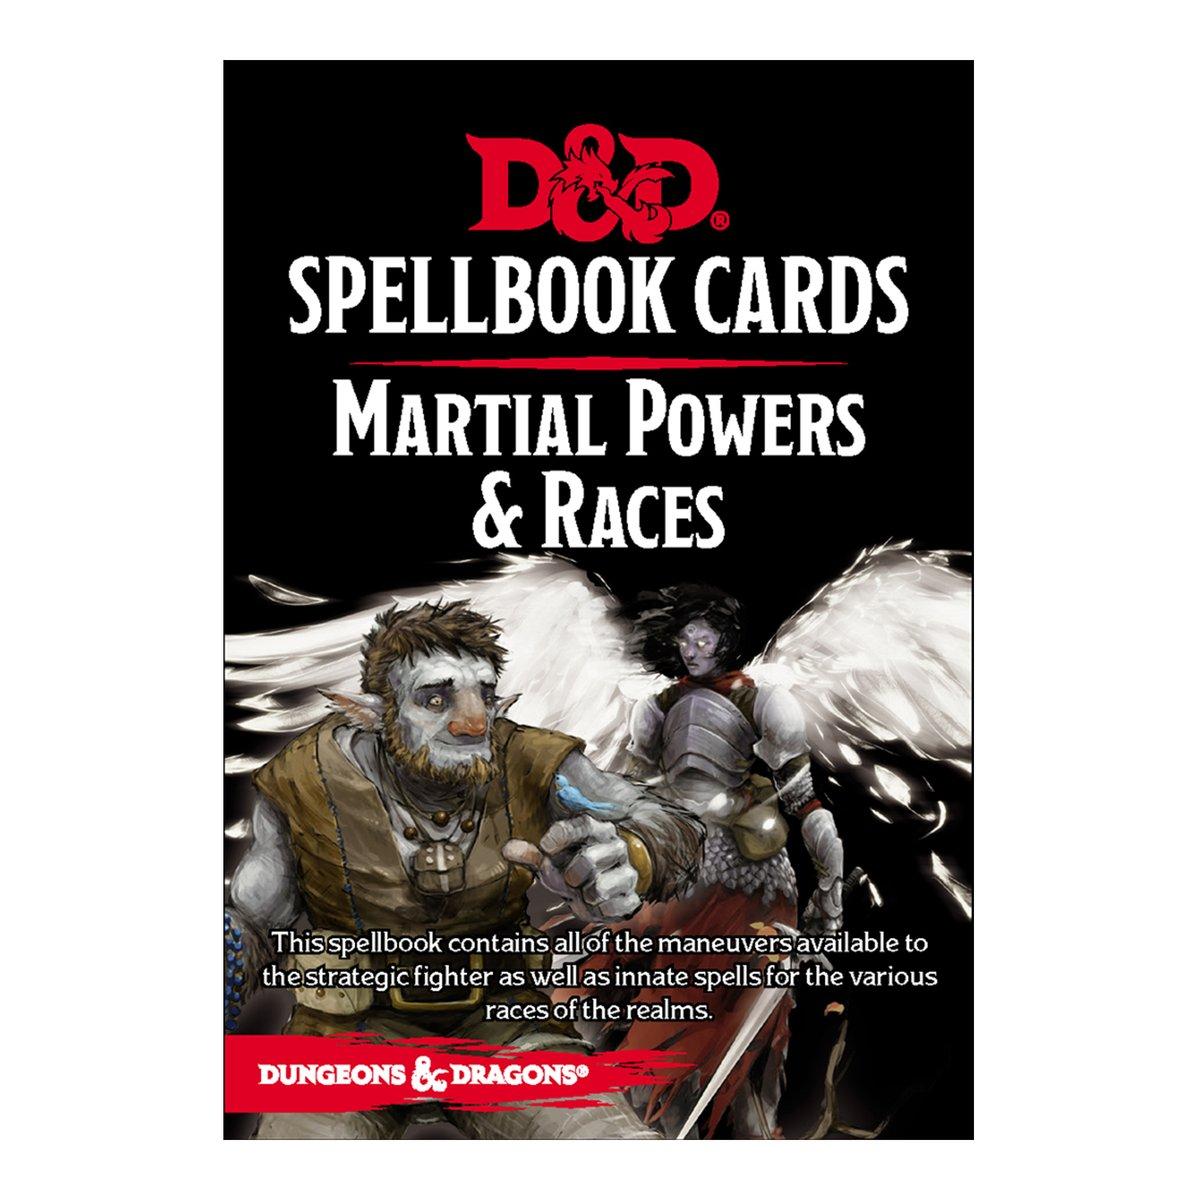 D & D Spellbook Cards - Martial Powers & Races